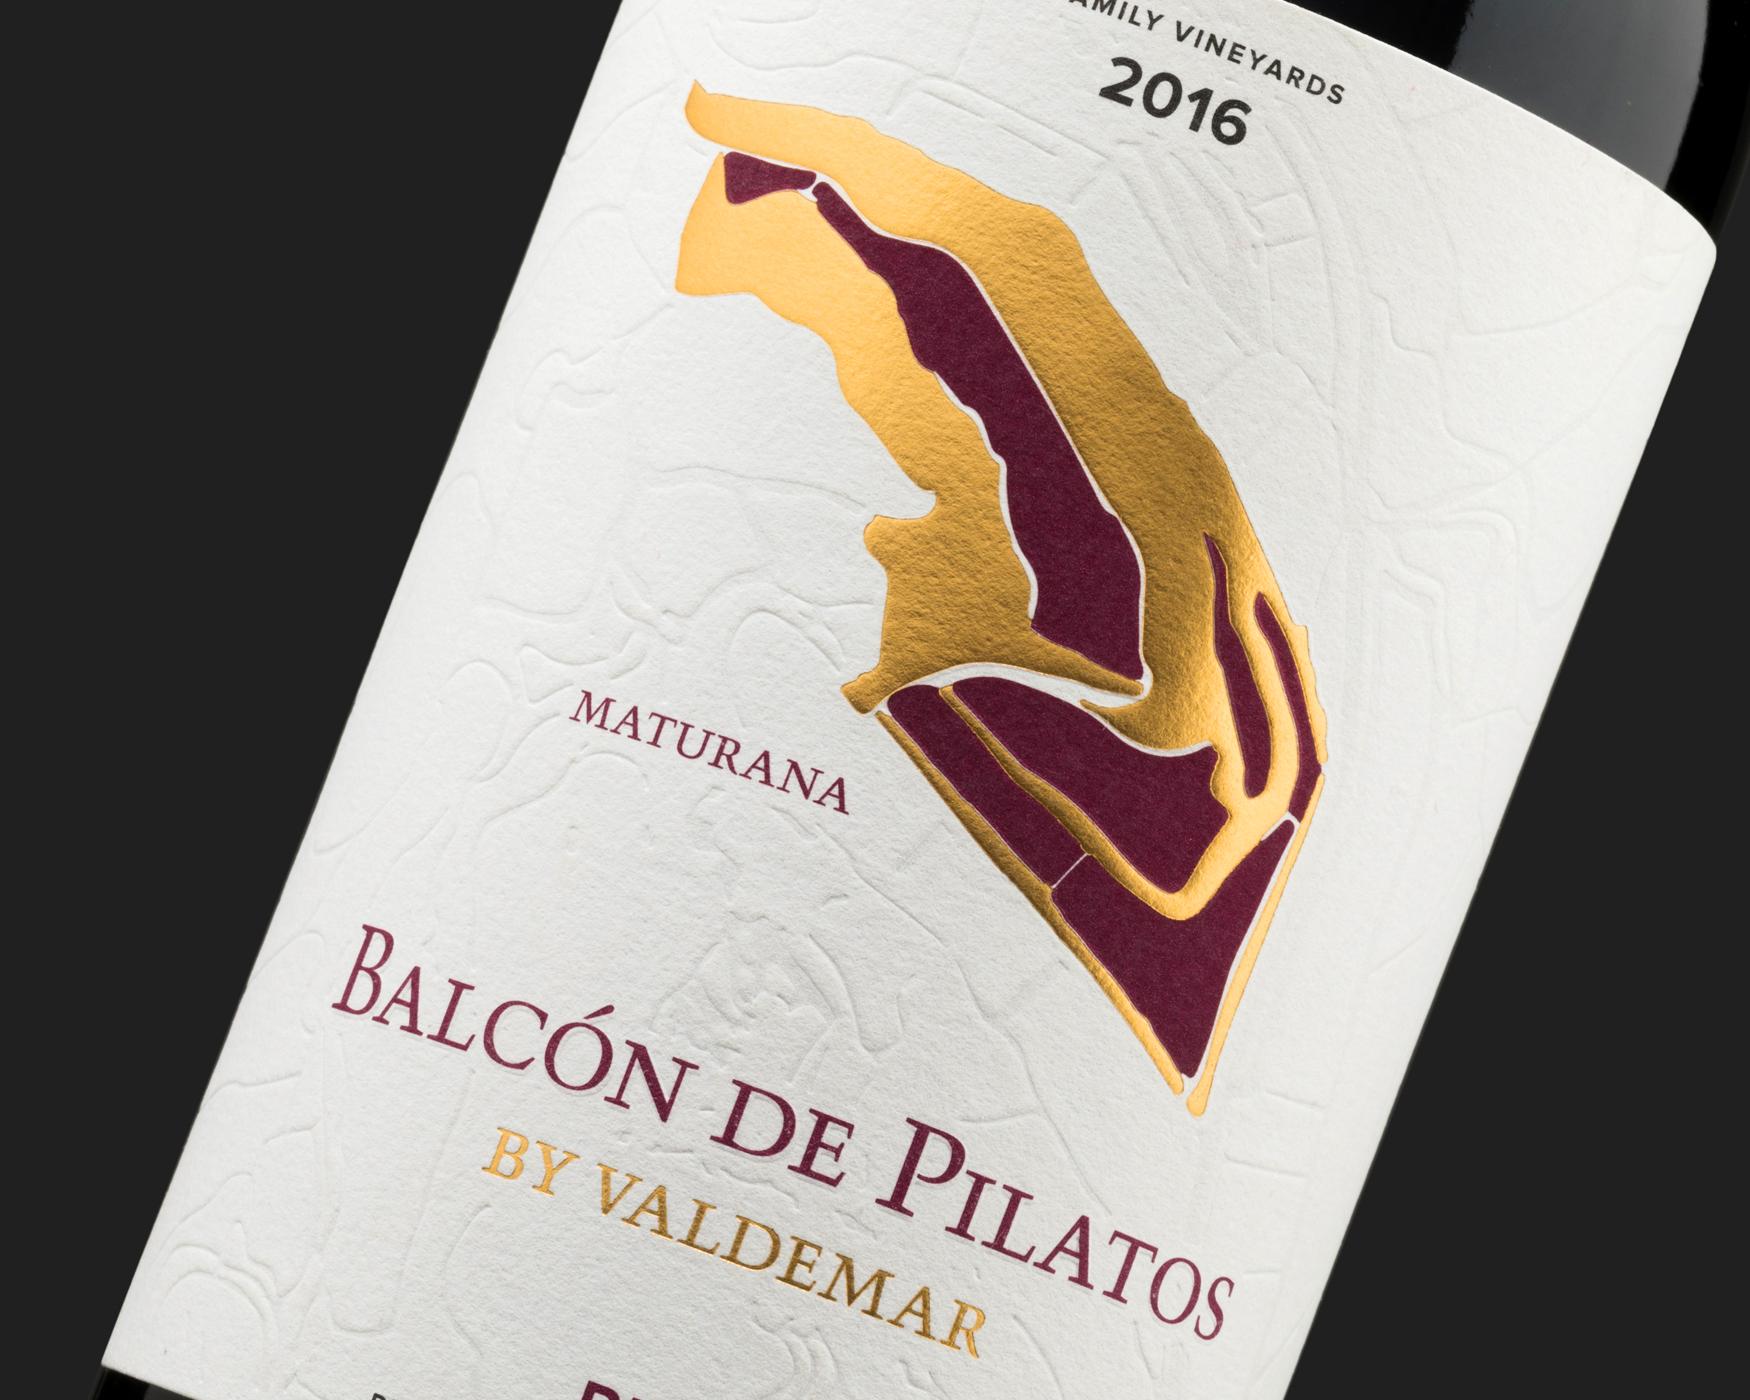 Vino Balcón de Pilatos. Etiquetas adhesivas. Labelgrafic